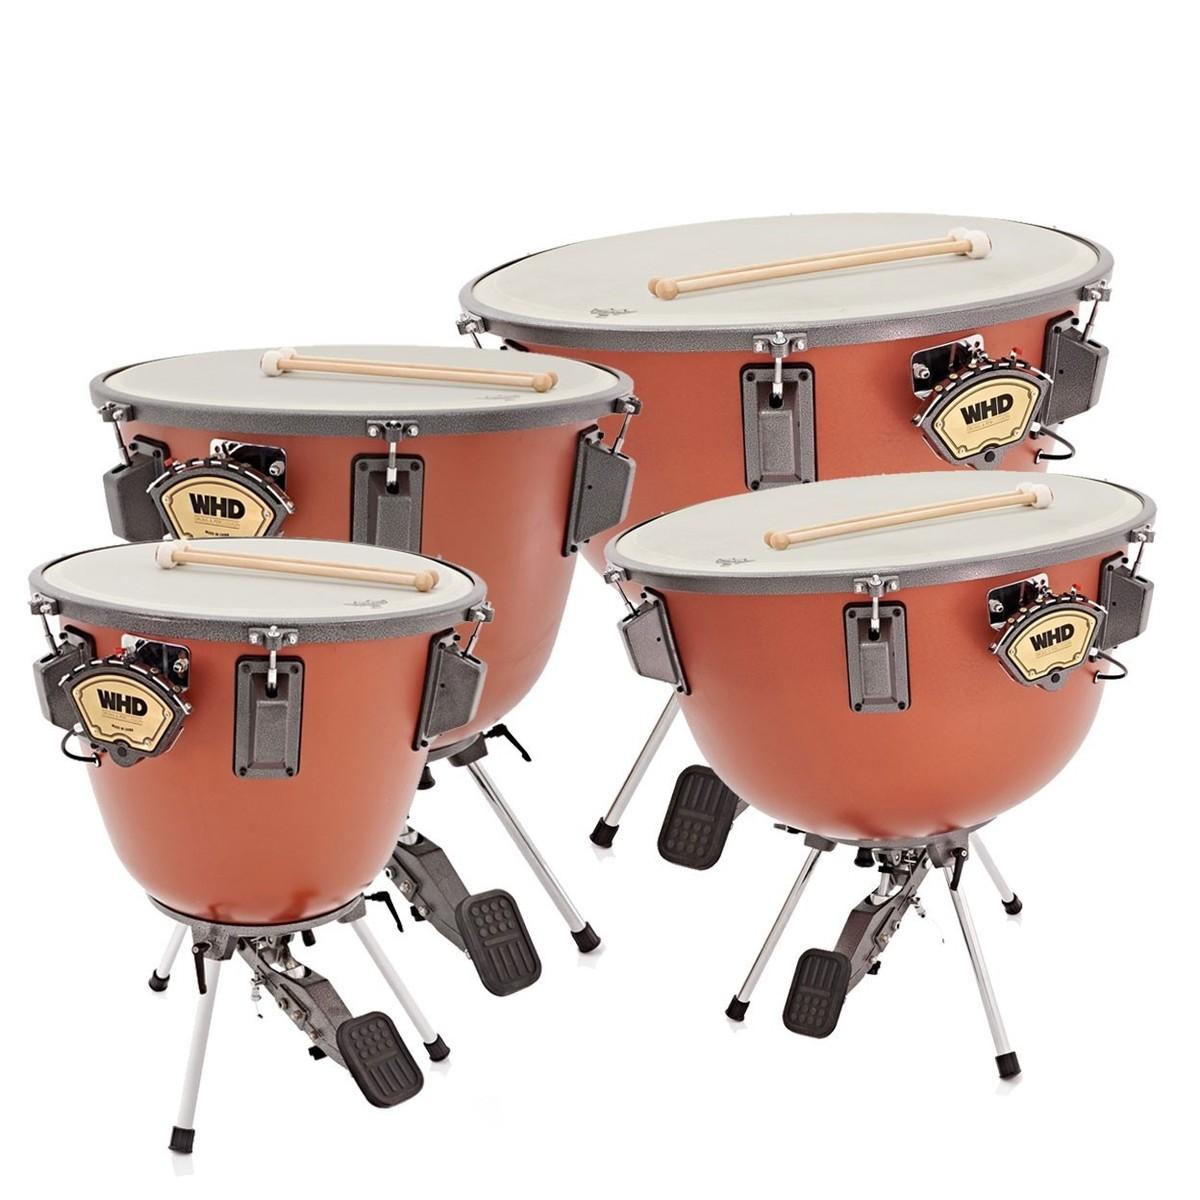 WHD Complete Timpani Drum Set